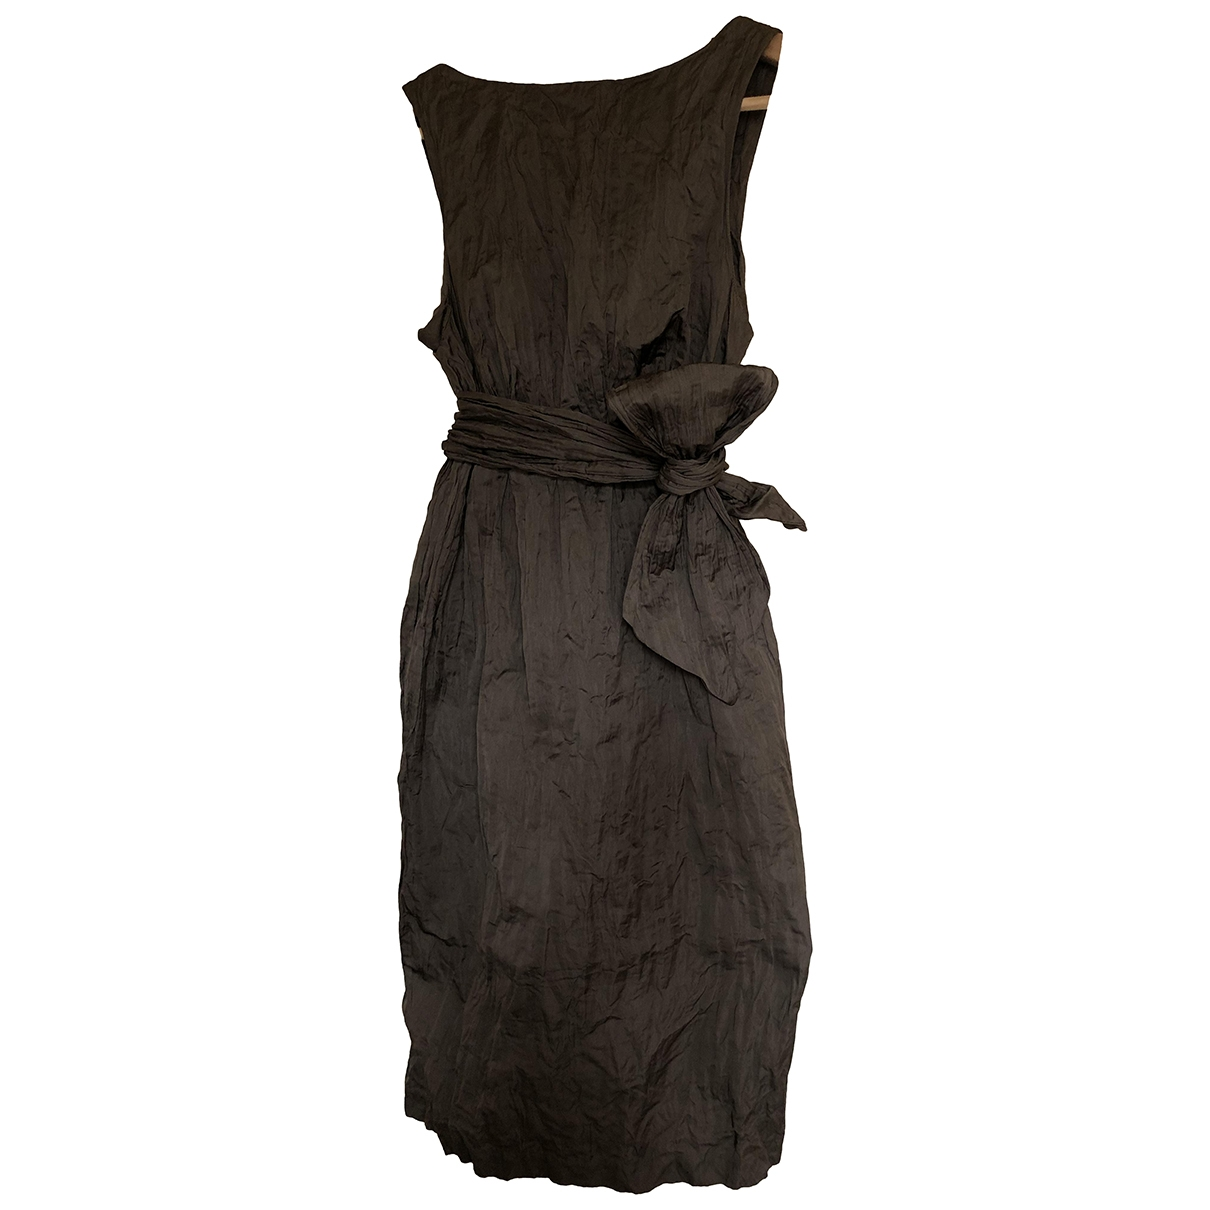 Hoss Intropia \N Brown dress for Women 36 IT